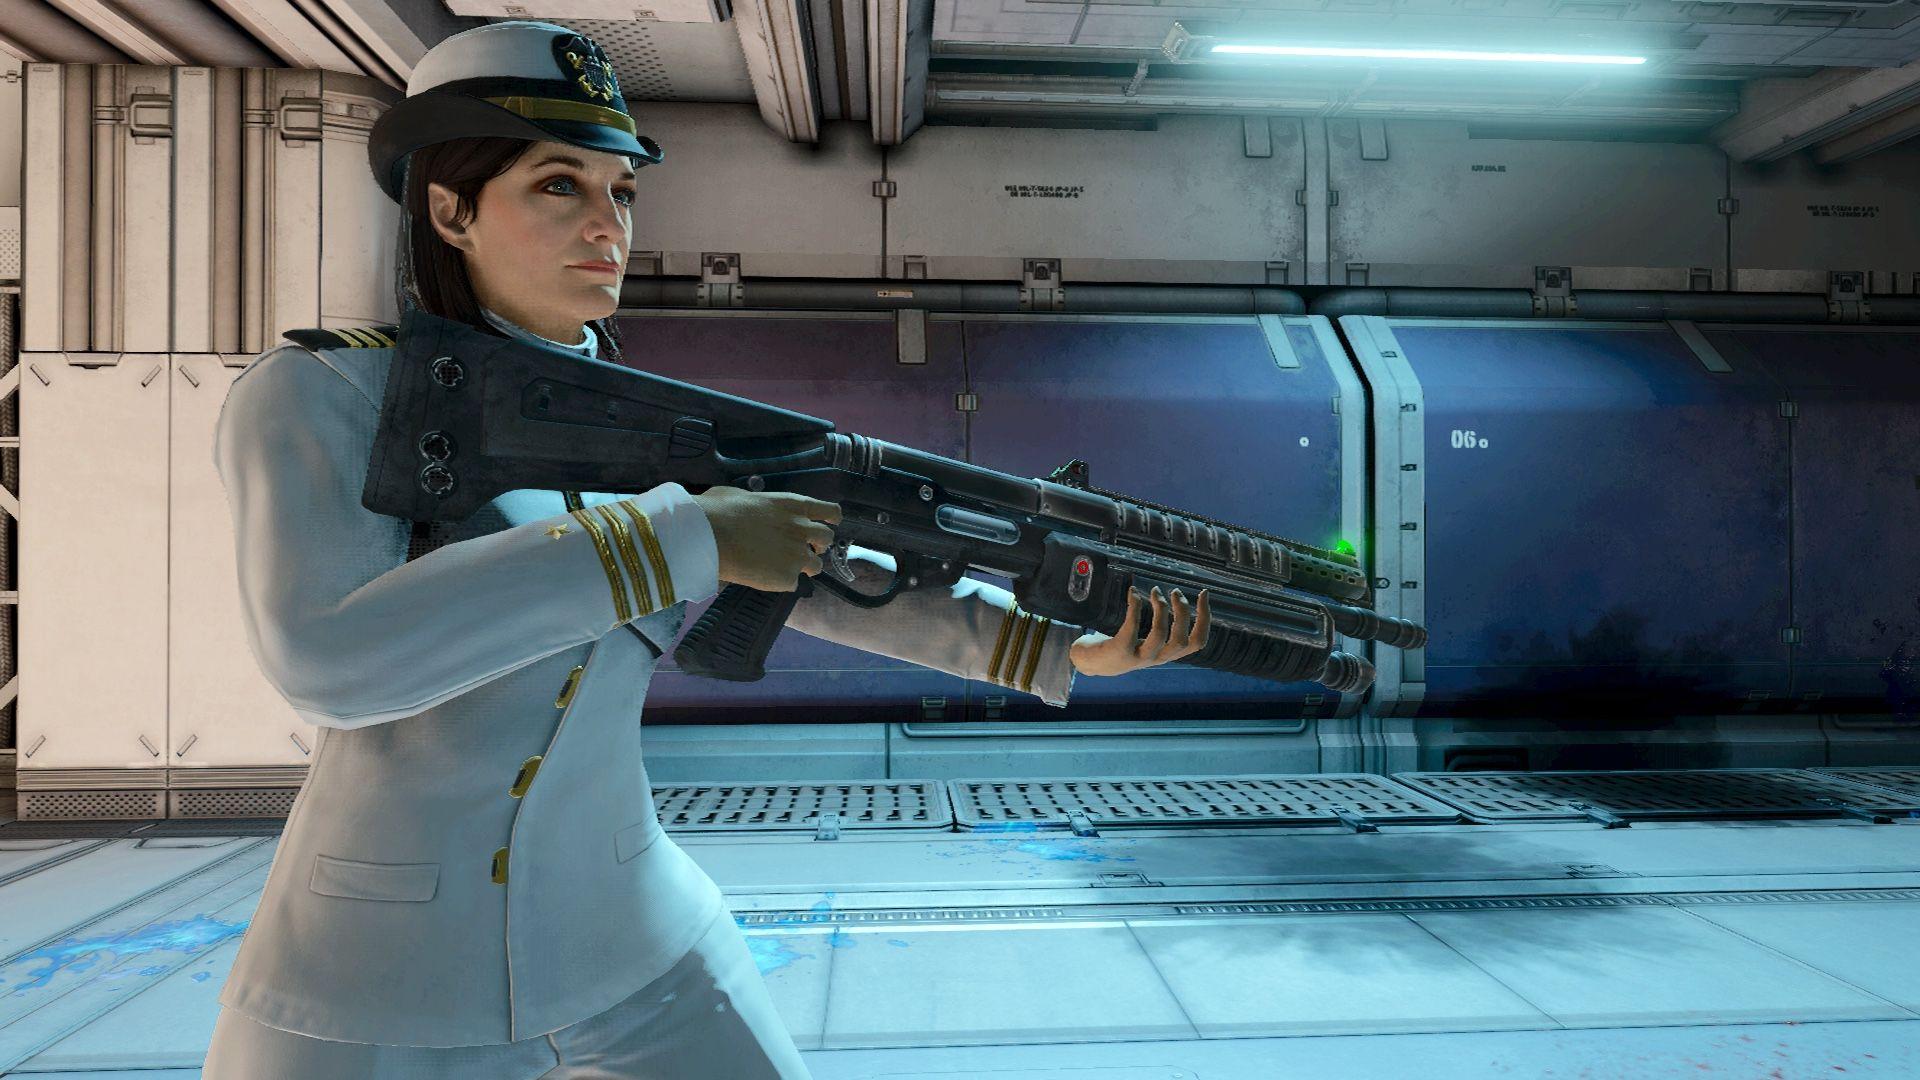 Halo 2 anniversary Miranda Keys dosnt have a gun 😂😂😂 - YouTube